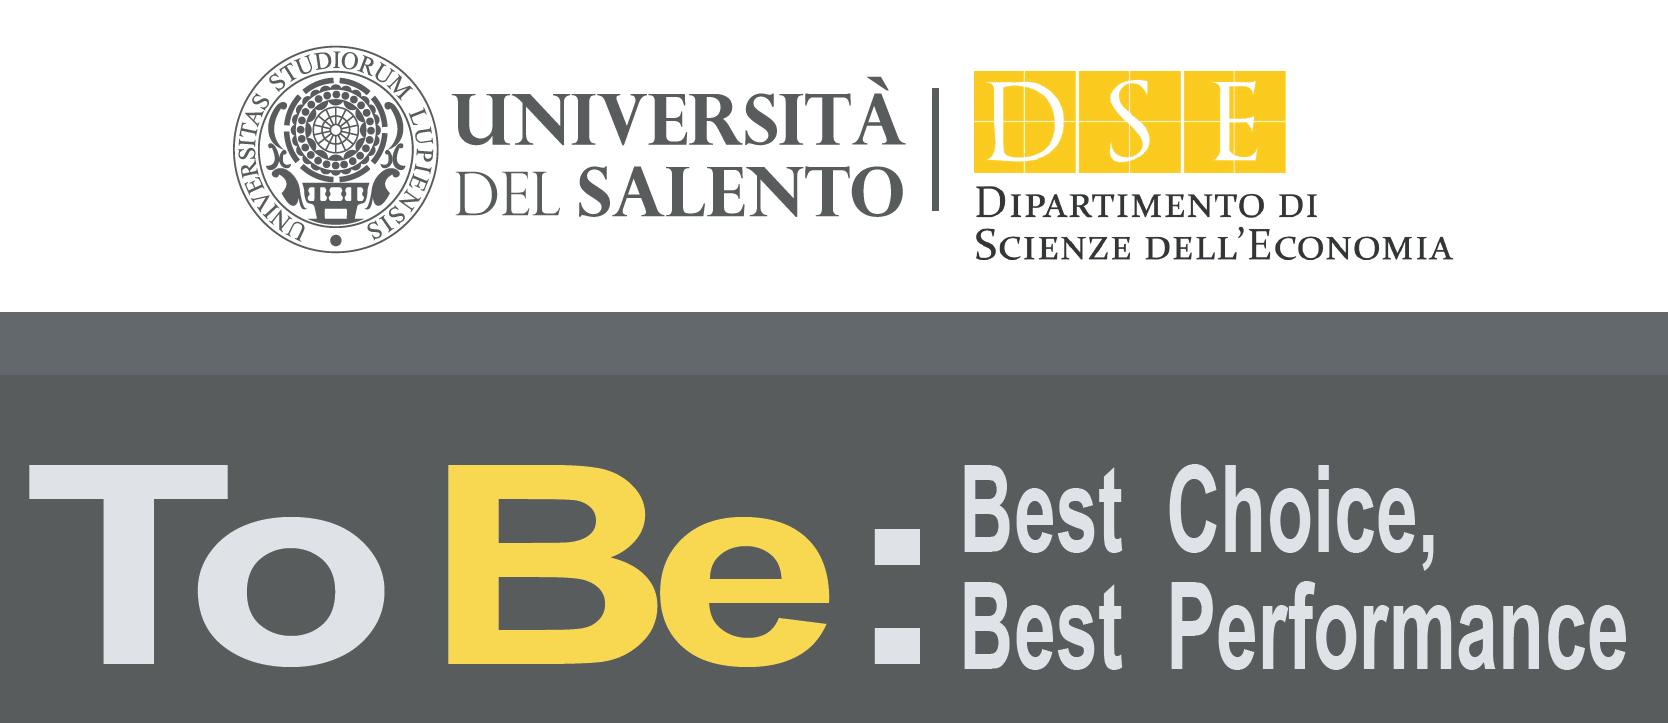 Università degli Studi del Salento - orientamento universitario.